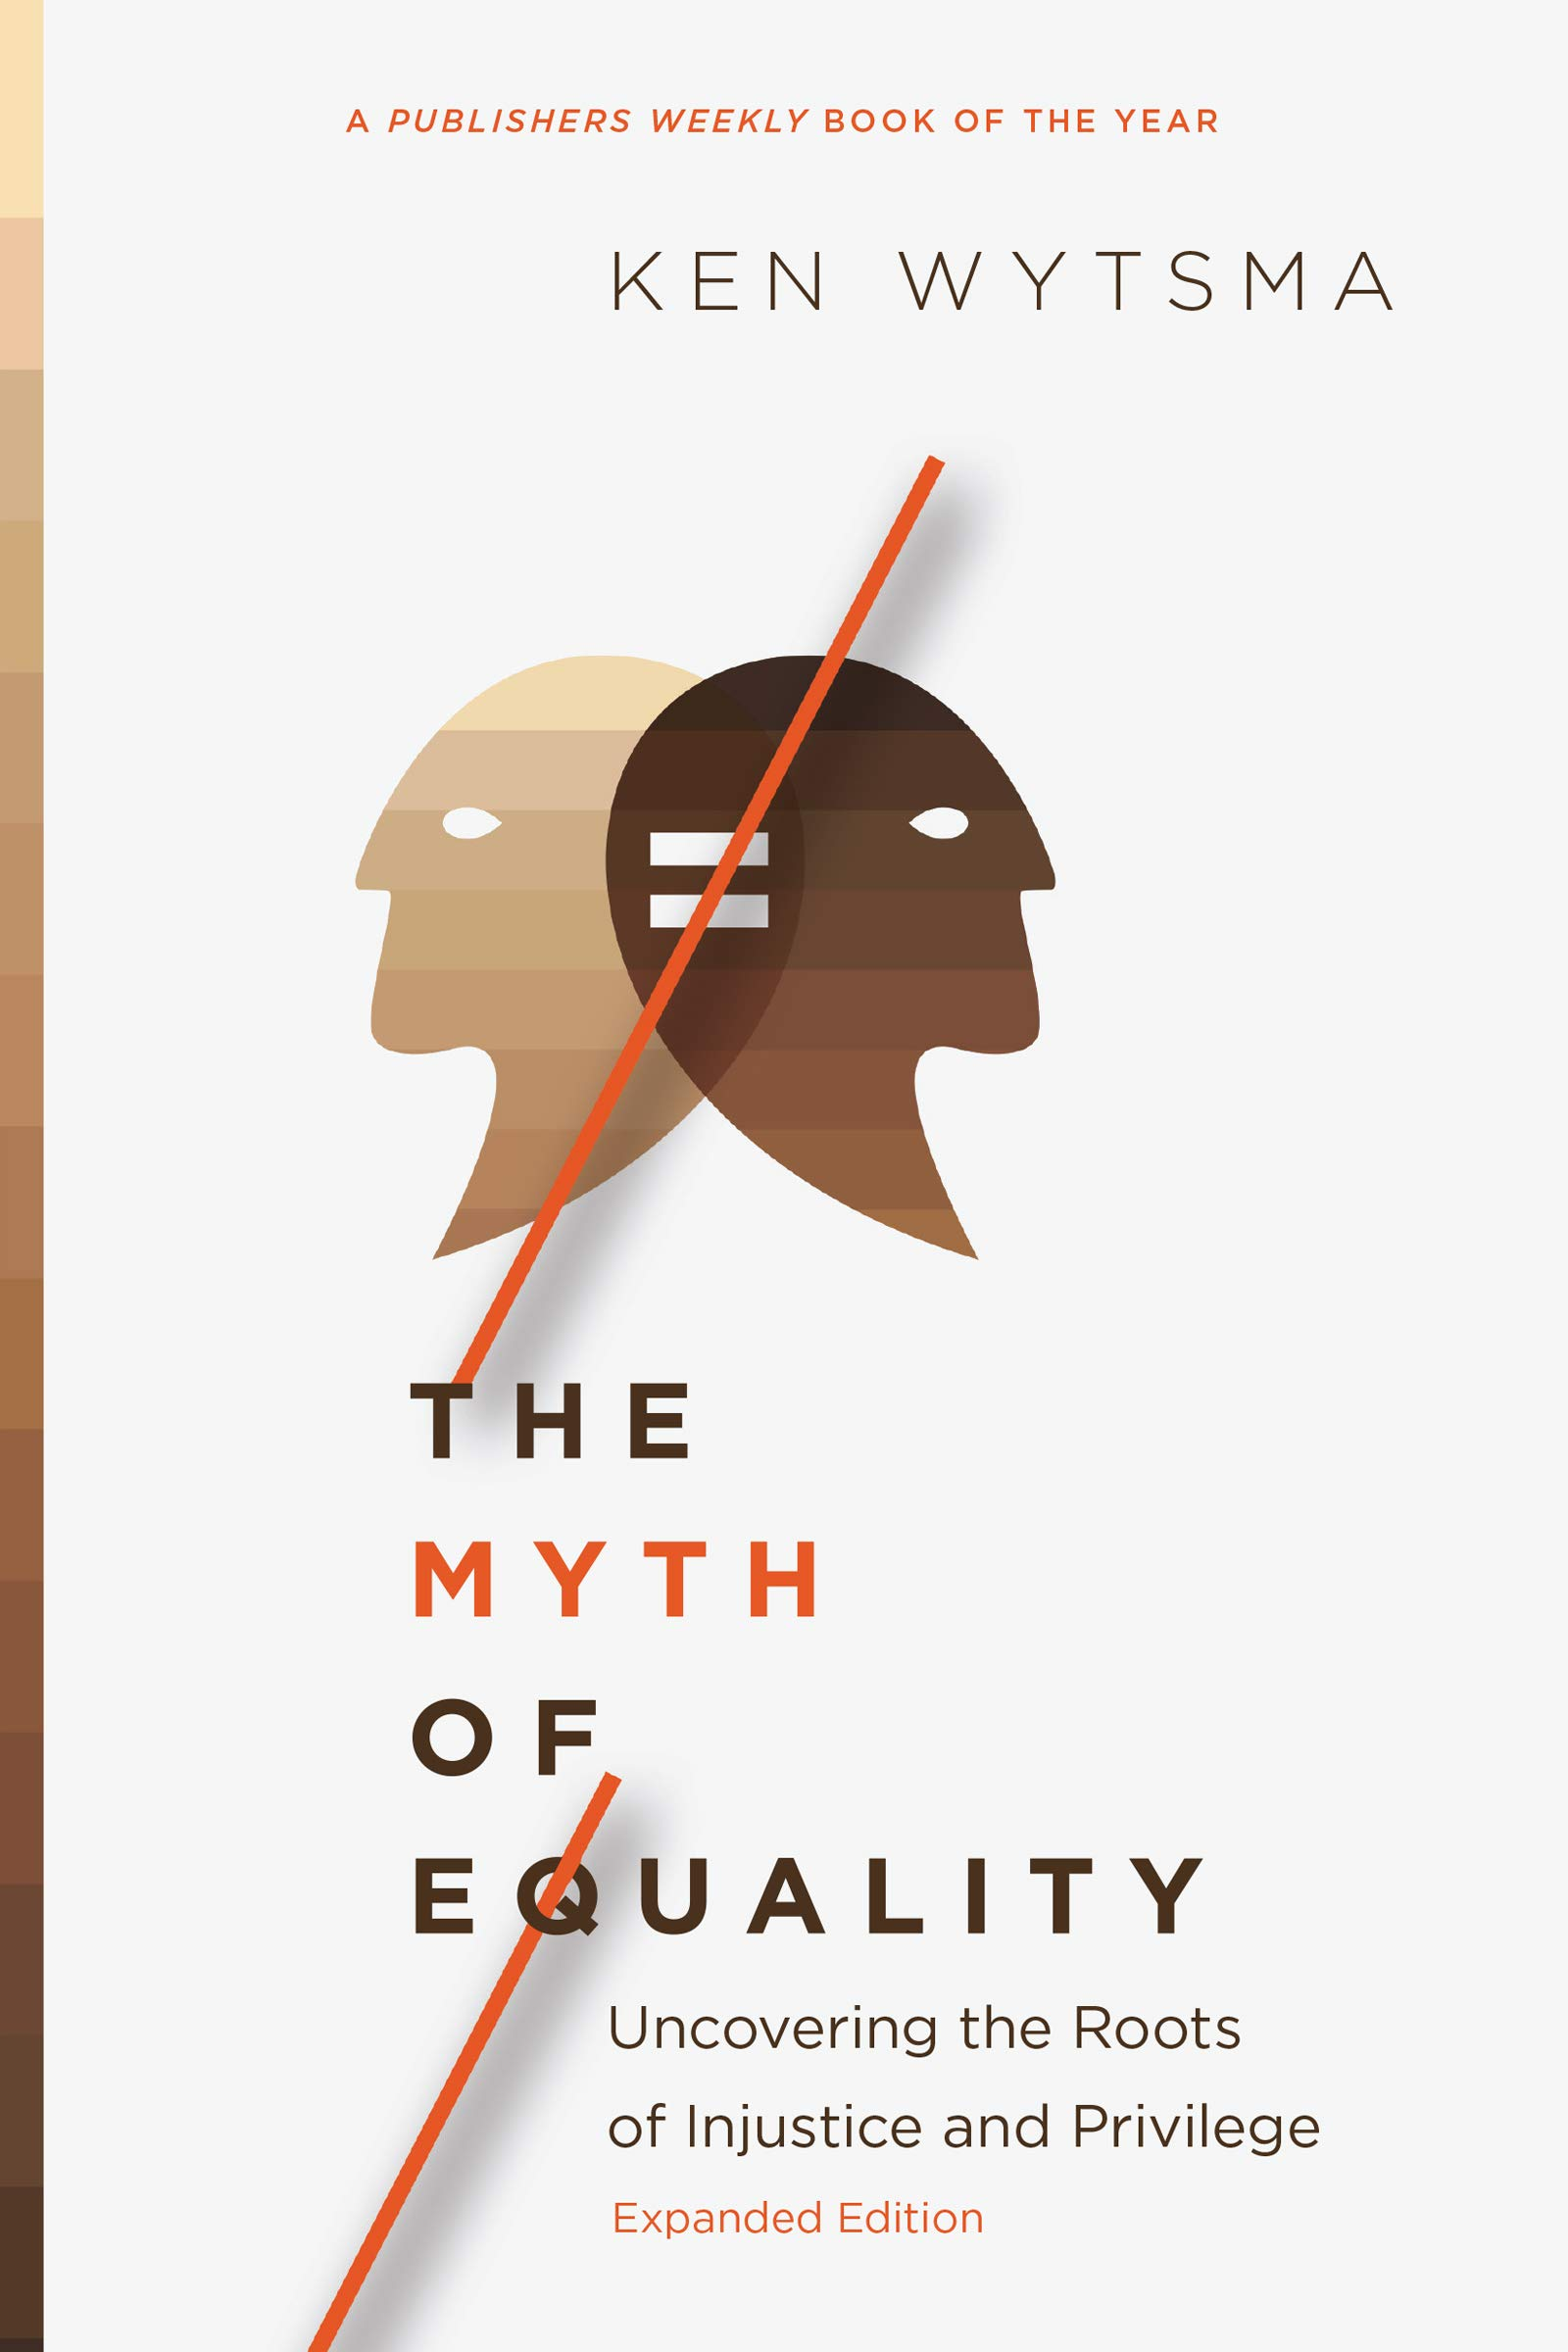 mythofequality.jpg